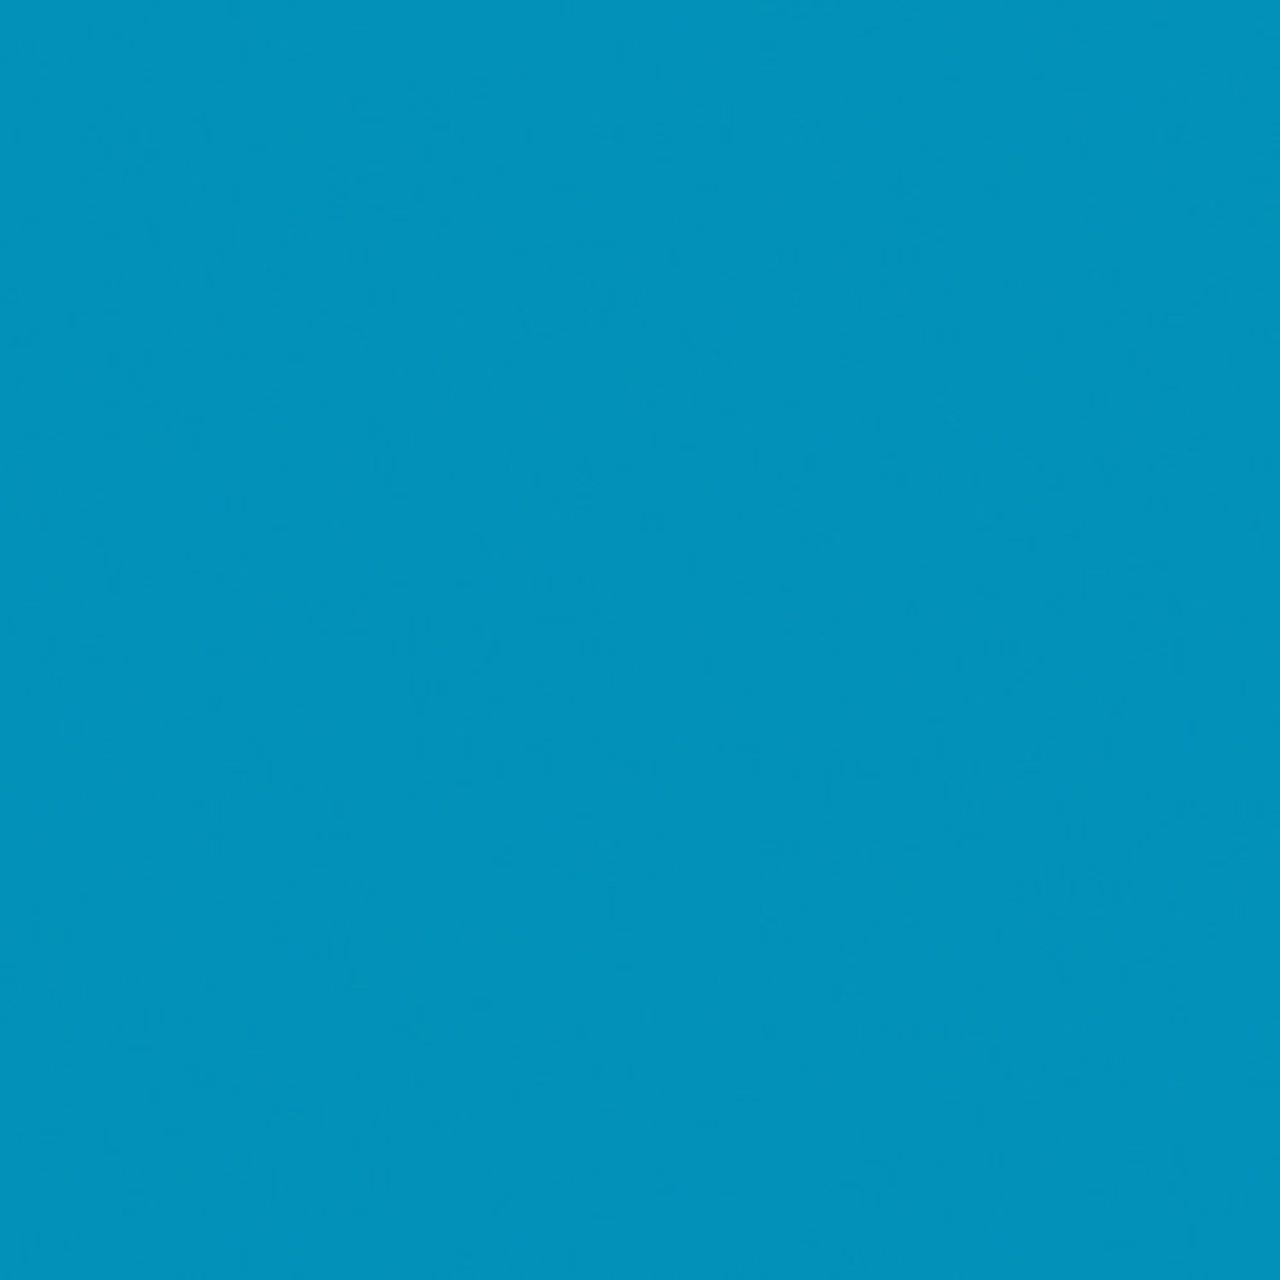 "#0071 Rosco Gels Roscolux Sea Blue, 20x24"""